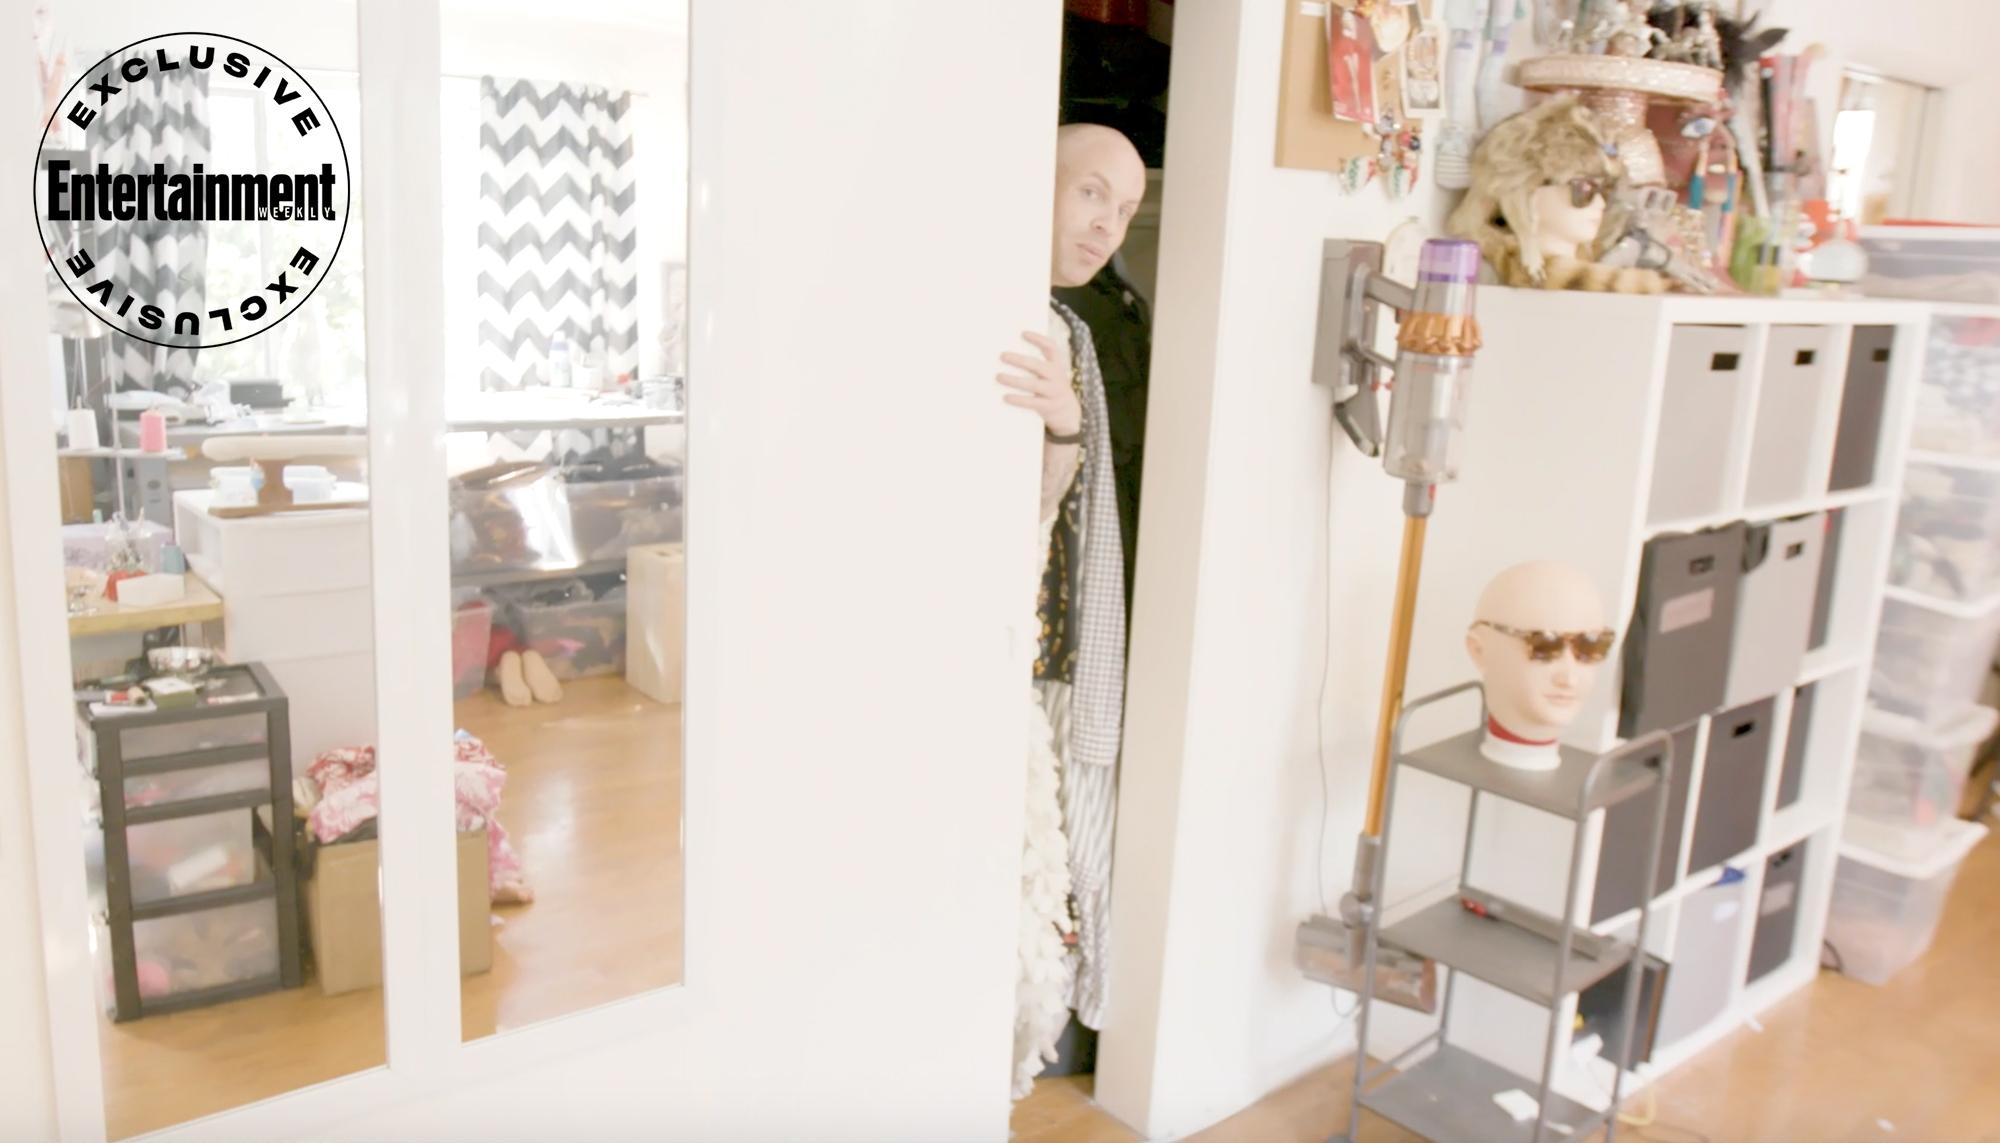 Katya, Out of the Closet